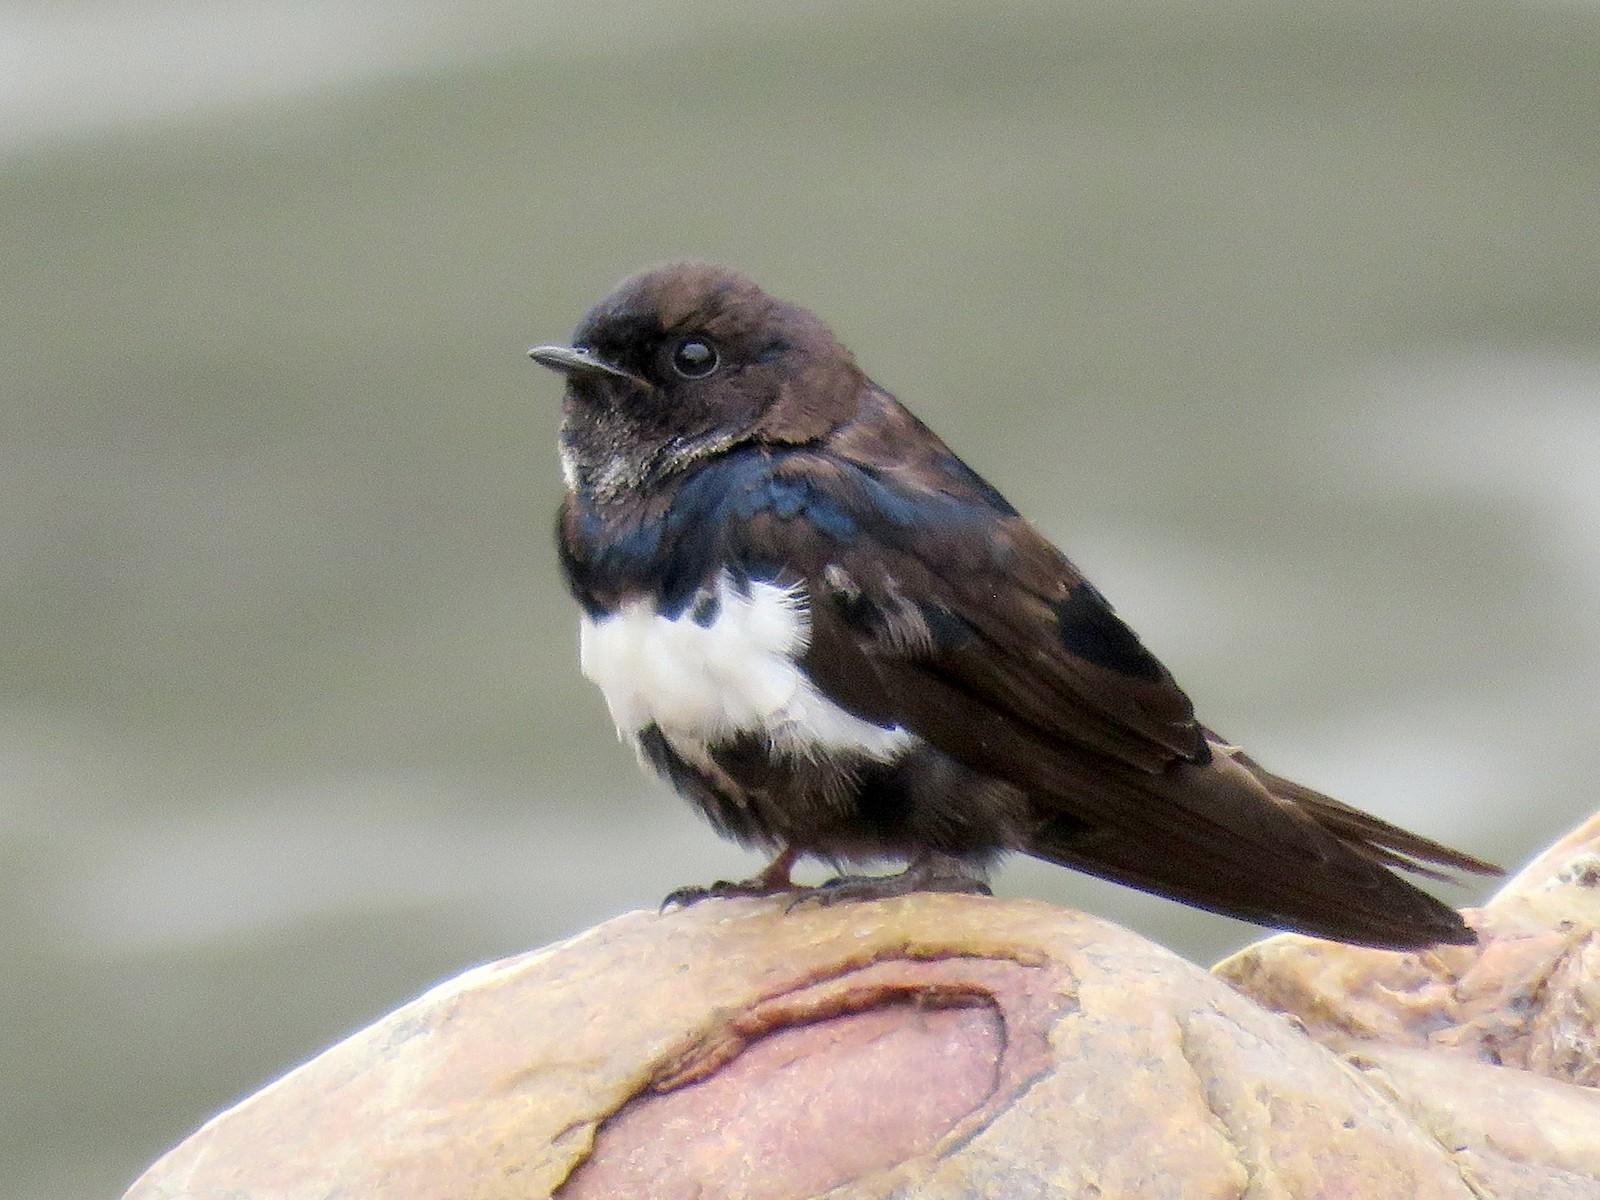 White-banded Swallow - Nestor Ccacya Baca